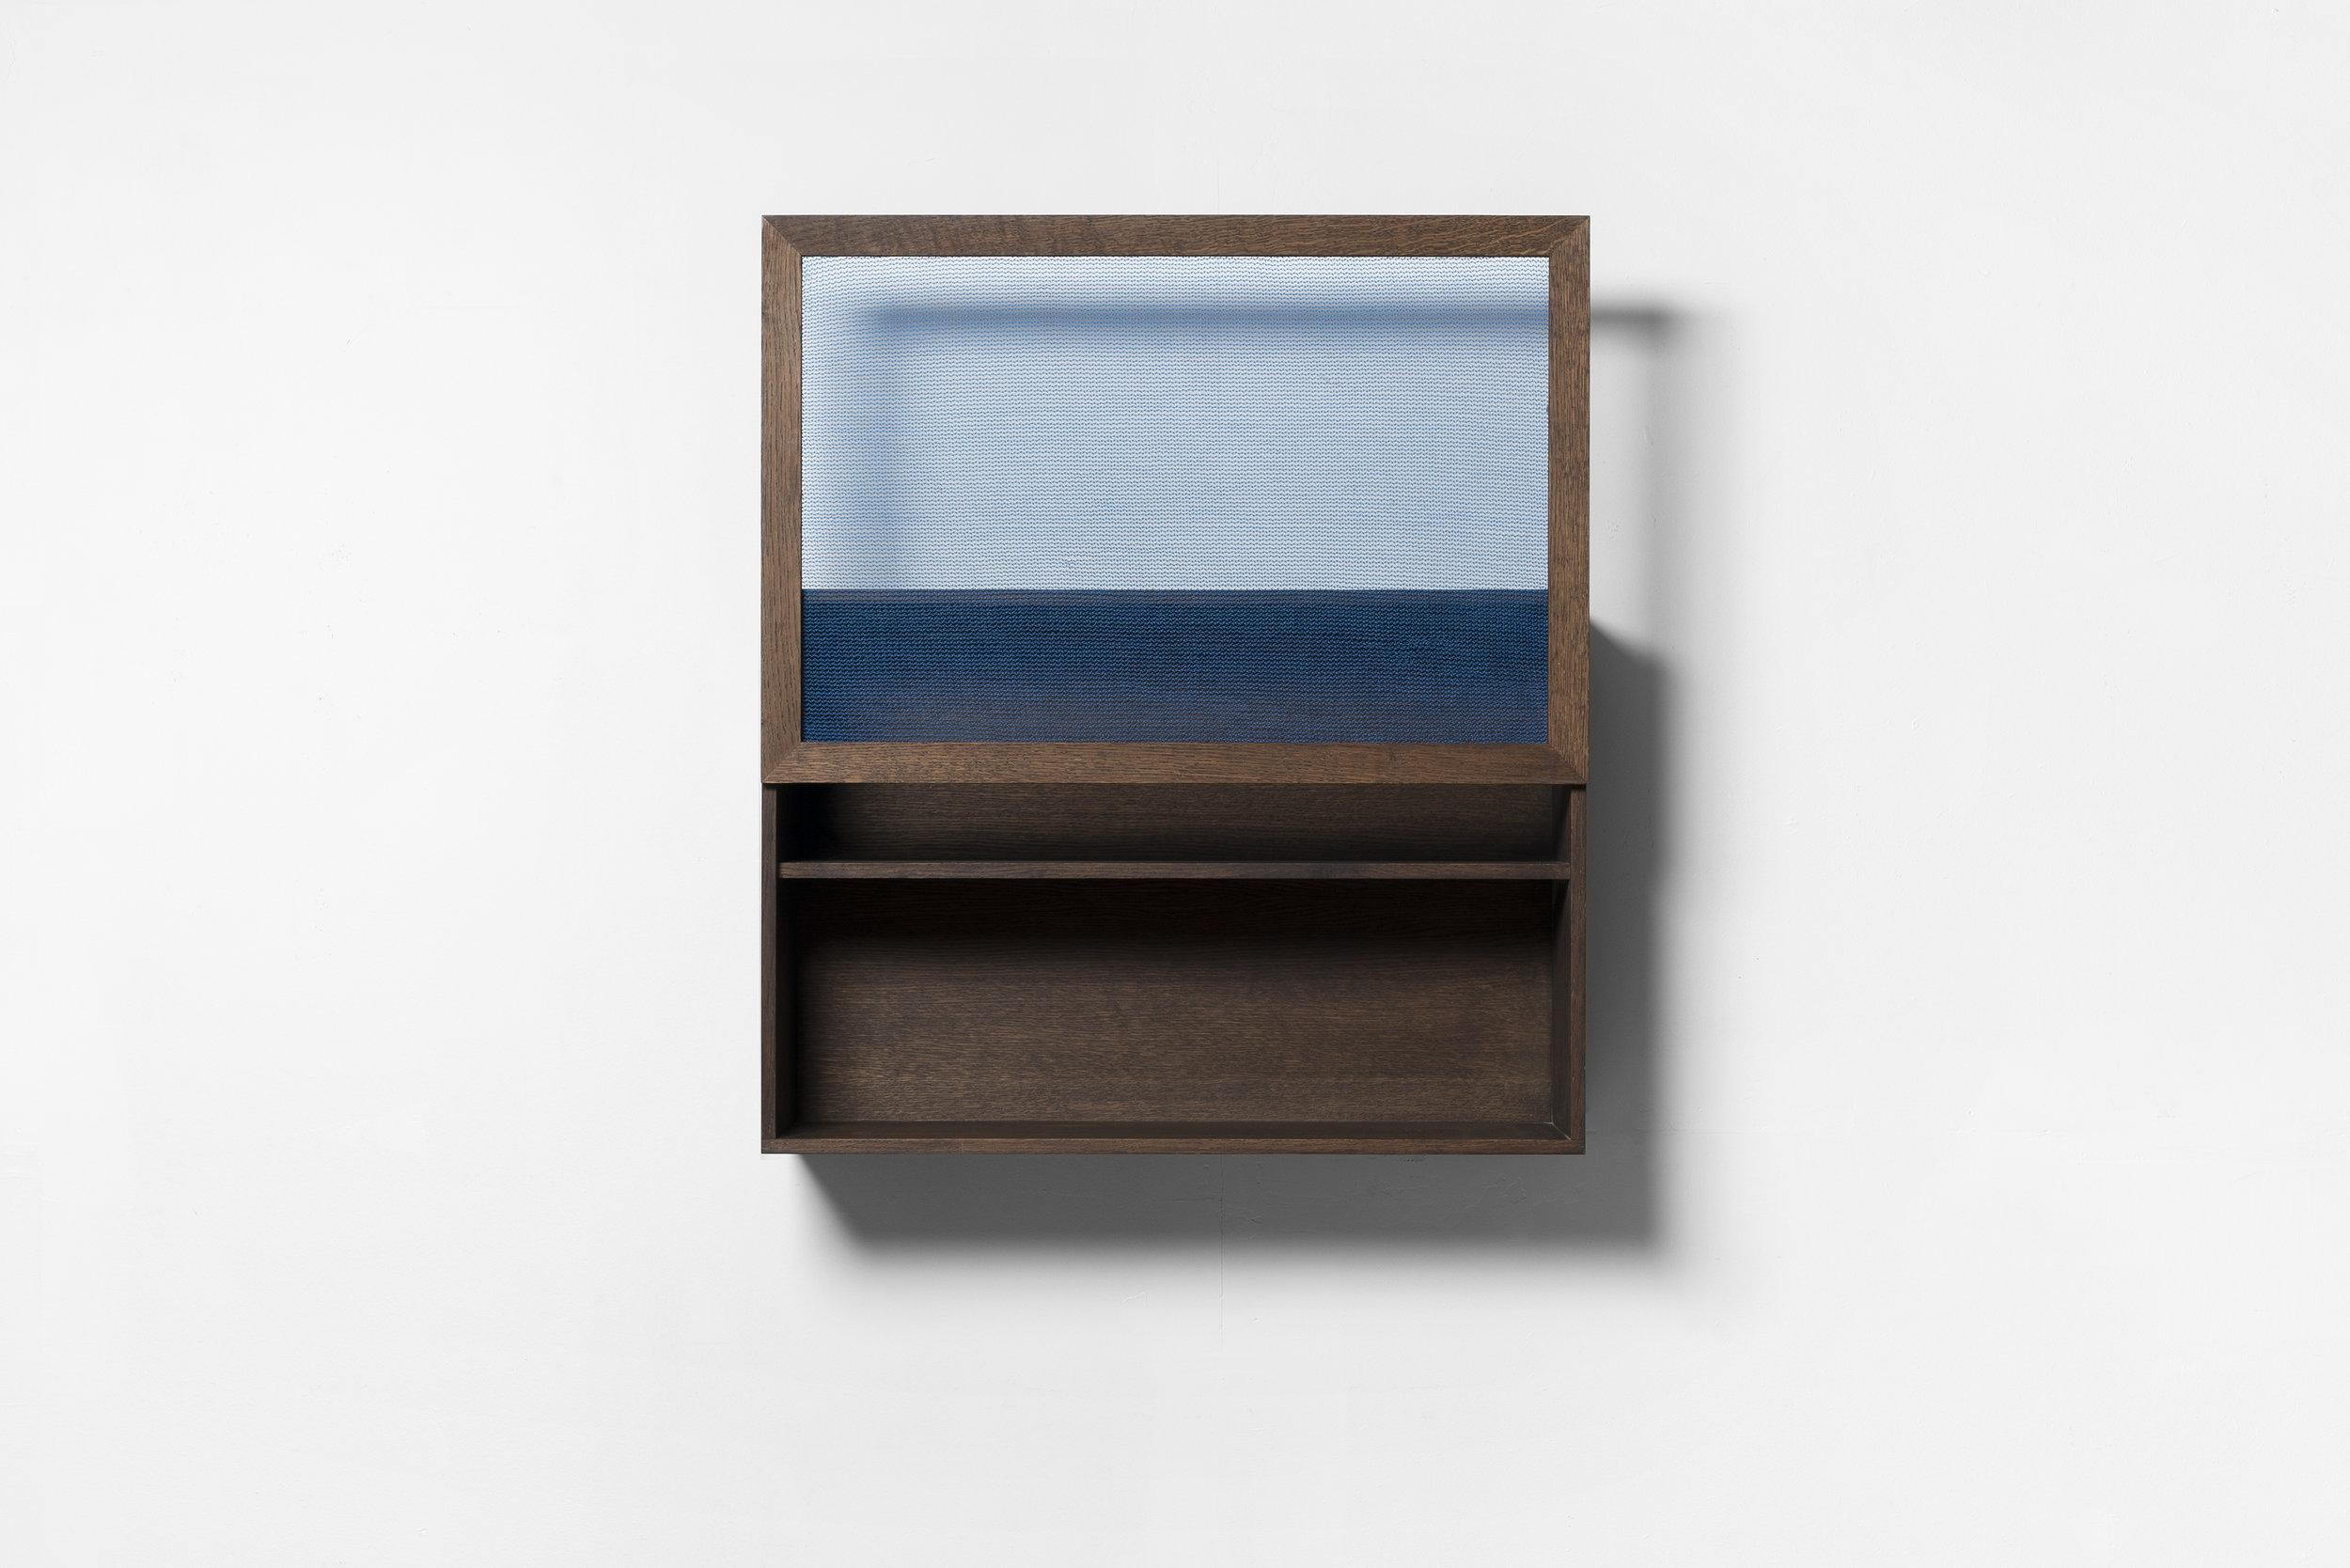 garde-manger bleu ouvert atelier365